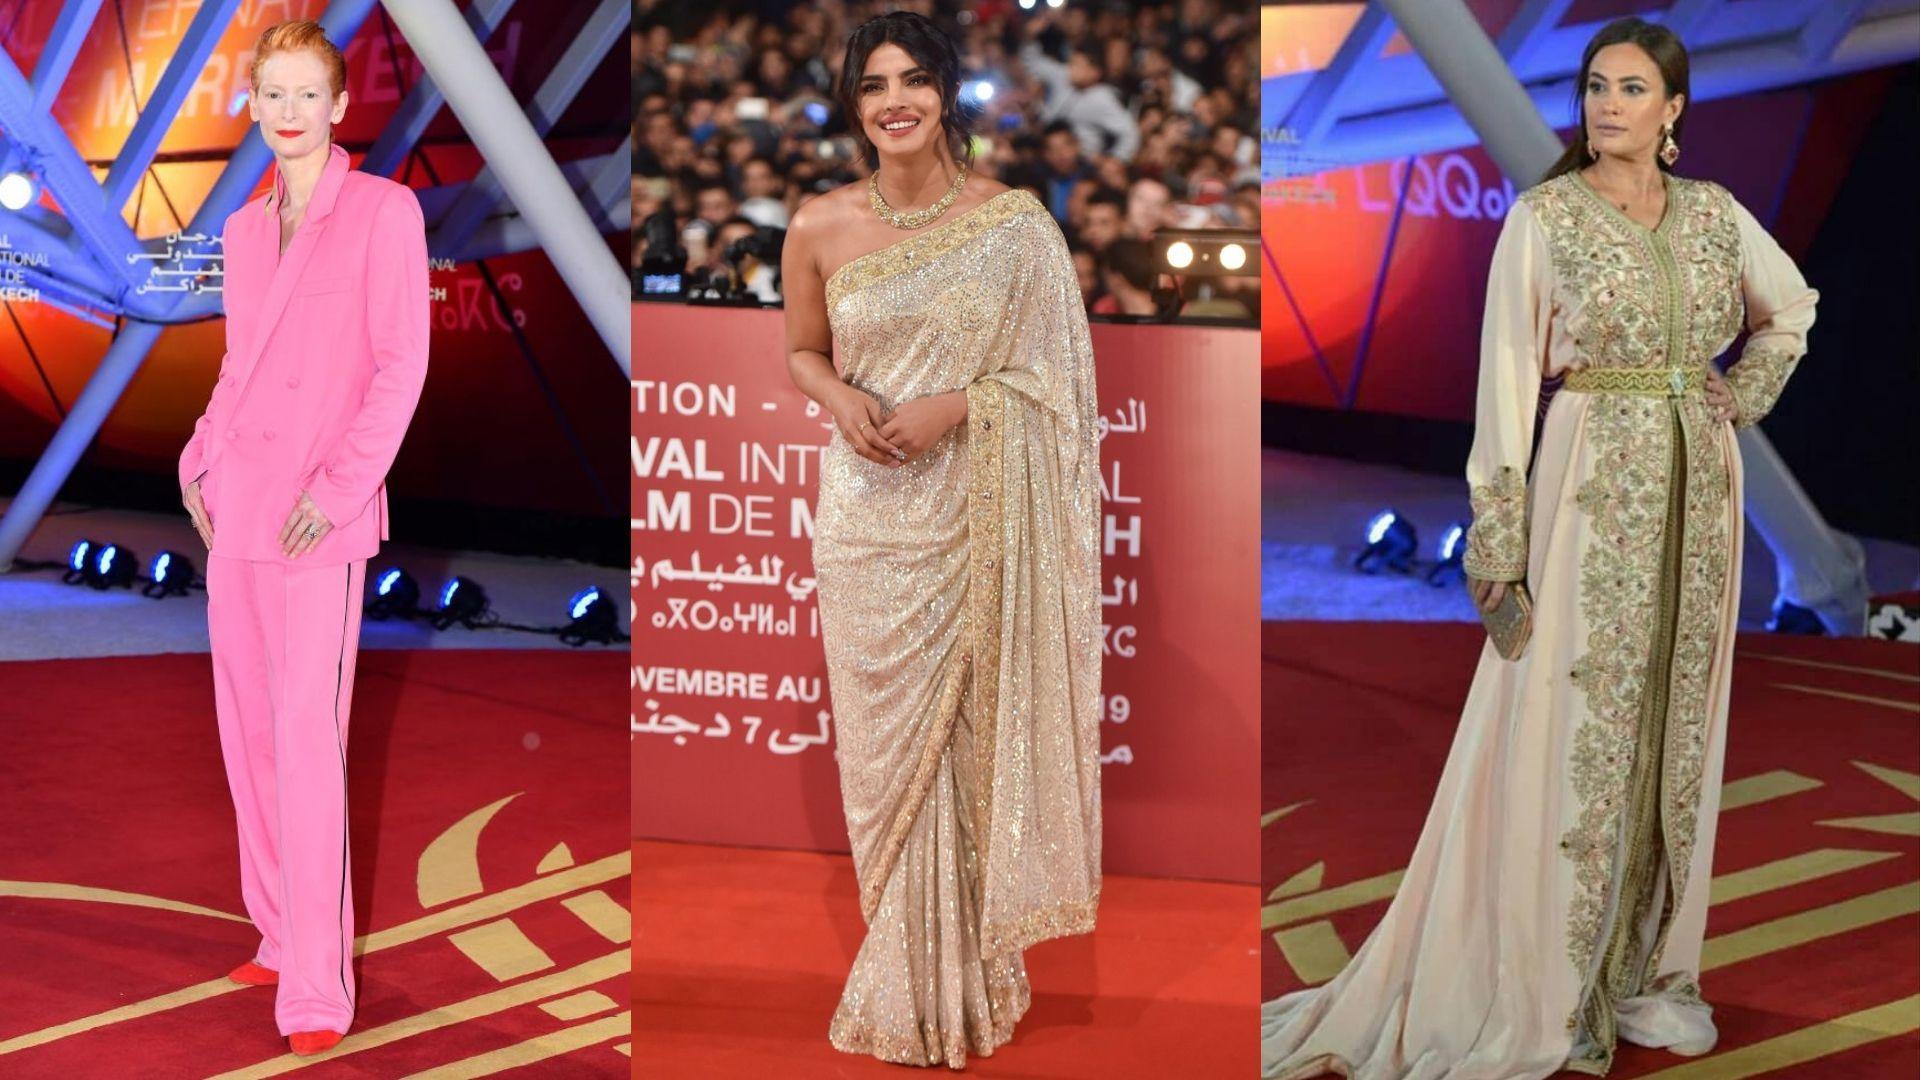 Marrakech International Film Festival 2019: The Best Dressed Celebs